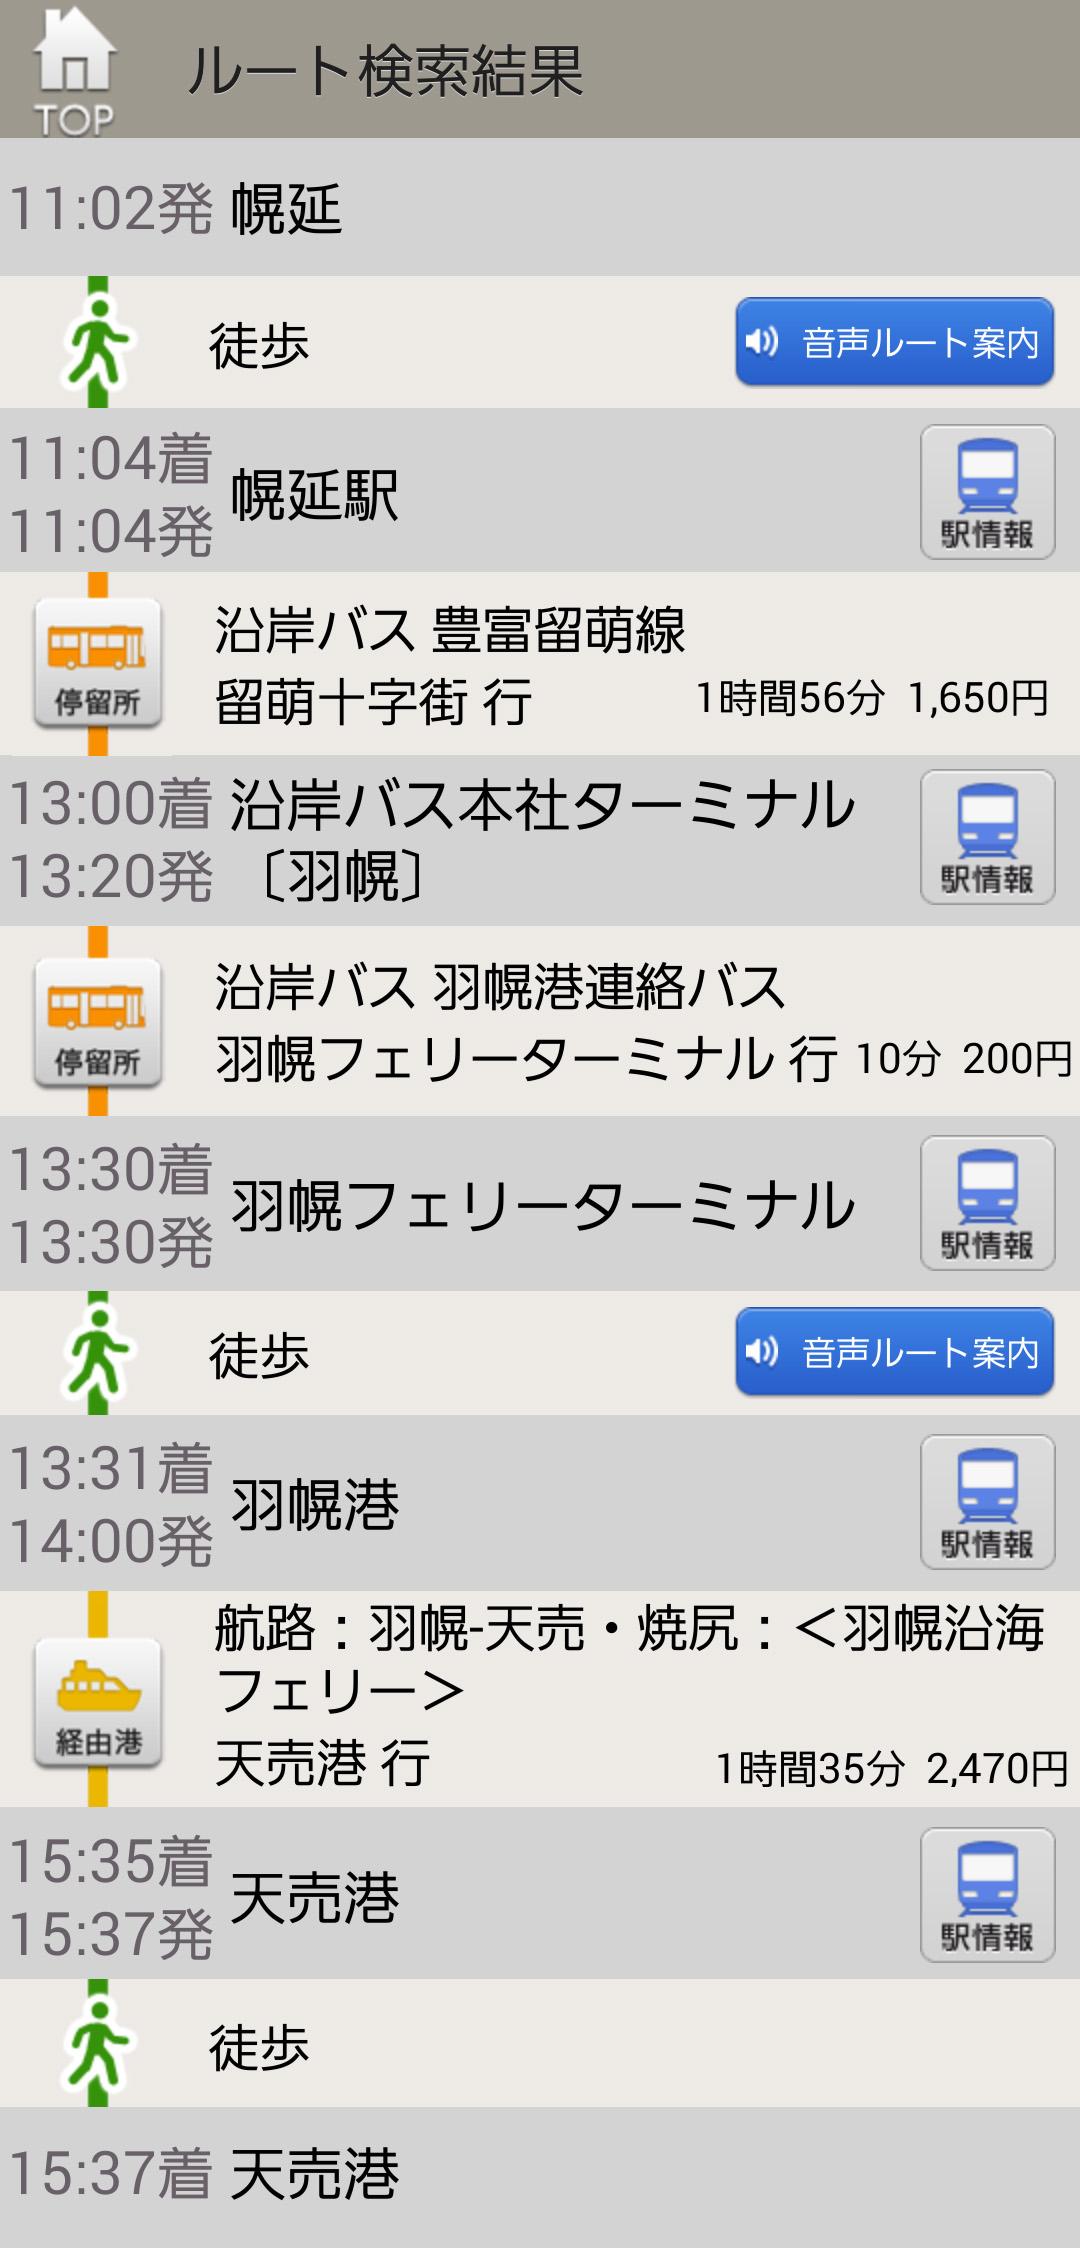 http://corporate.navitime.co.jp/topics/enganBUS%201.jpg